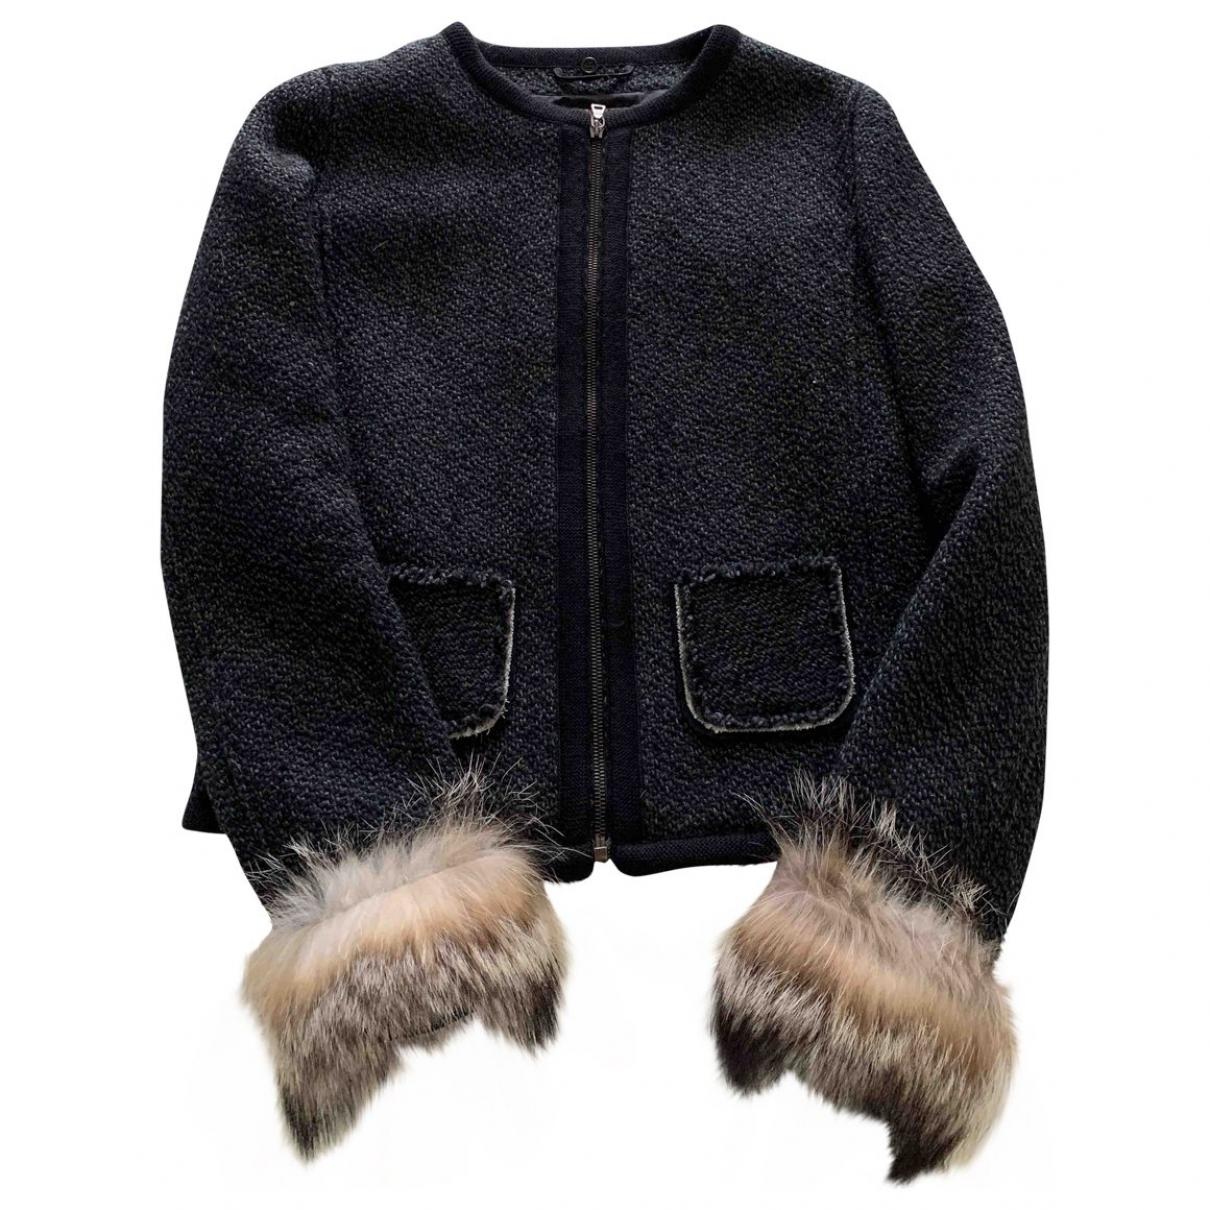 Prada \N Jacke in  Schwarz Wolle